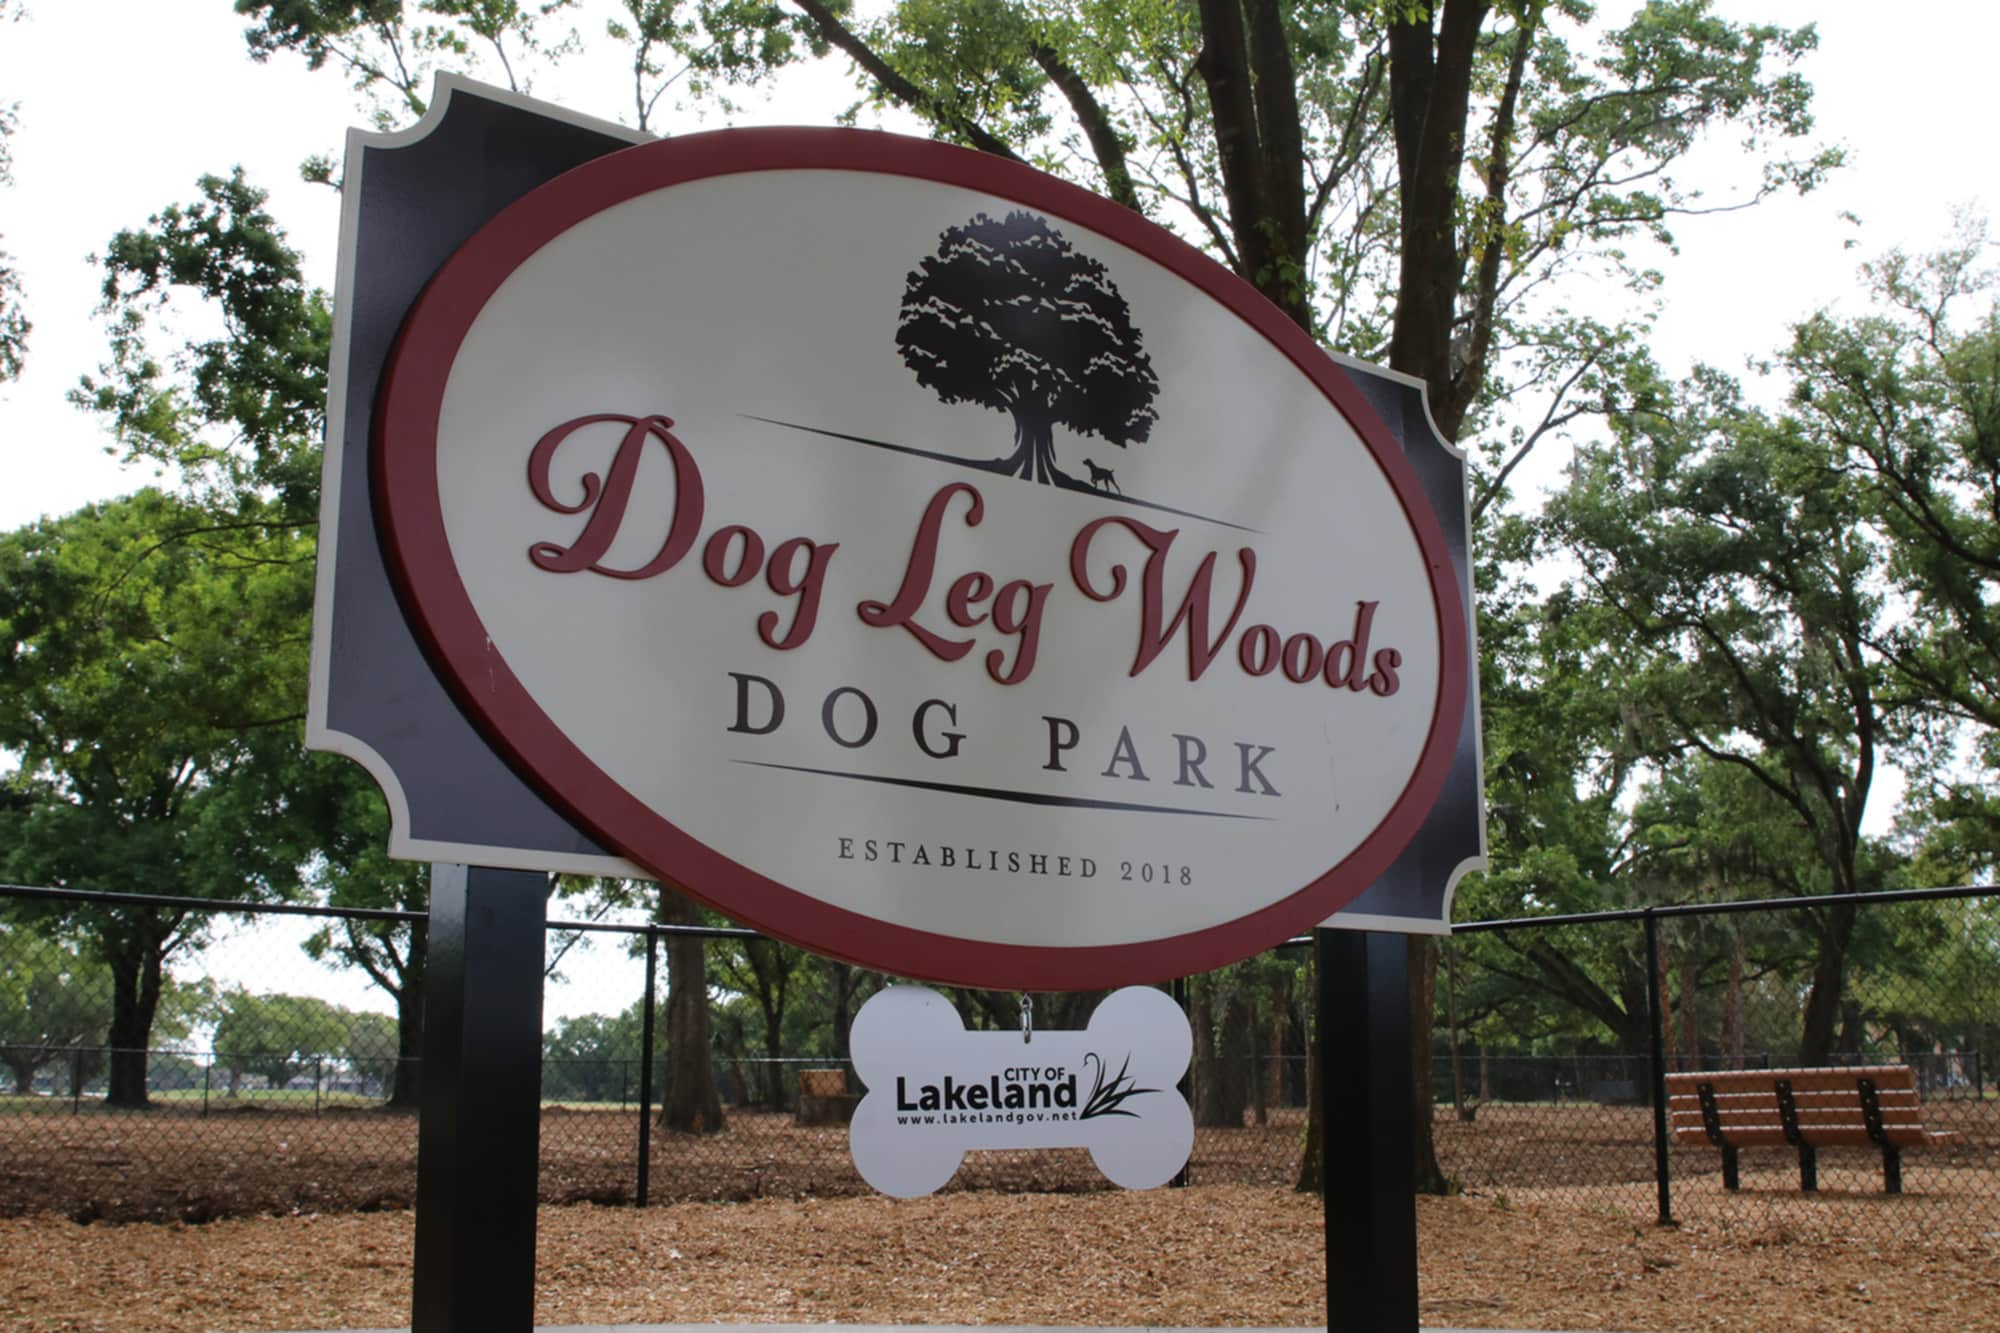 Sign at Dog Leg Woods Dog Park in Lakeland, FL